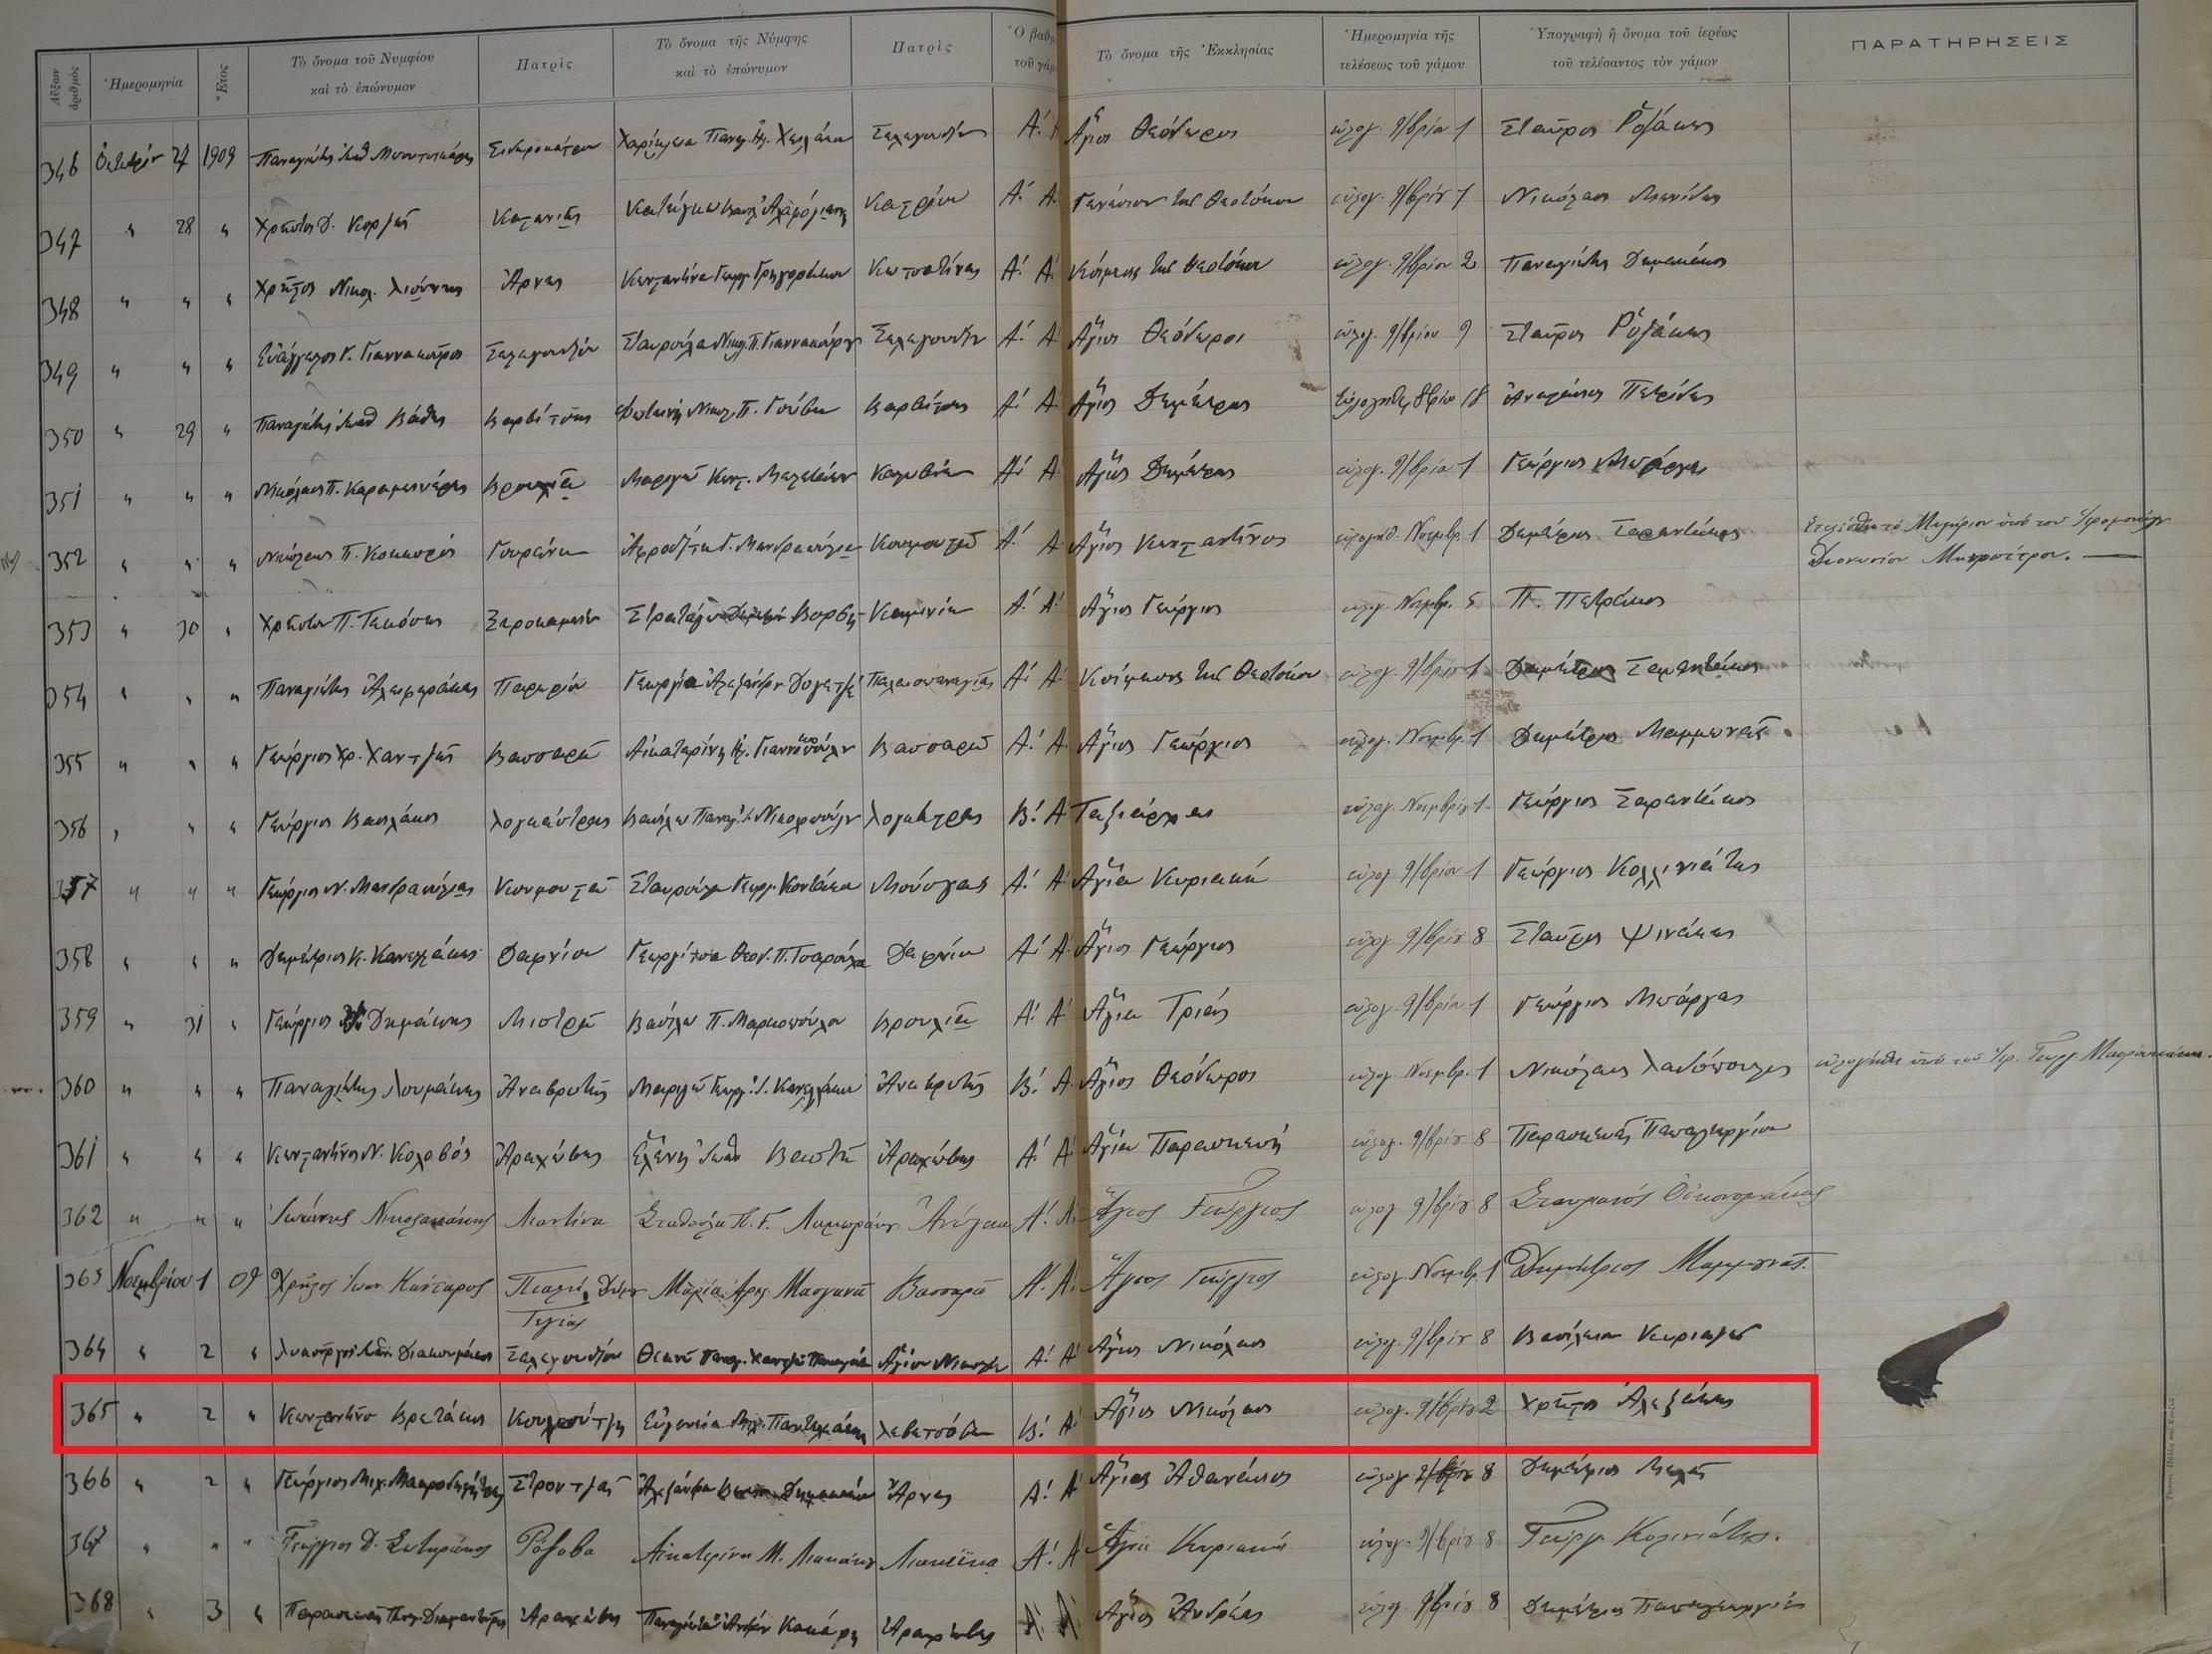 Marriage Record of Konstantinos Vretakos and Eygeneia Panteleaki [MyHeritage Sparta Marriages Collection, 1835–1935]